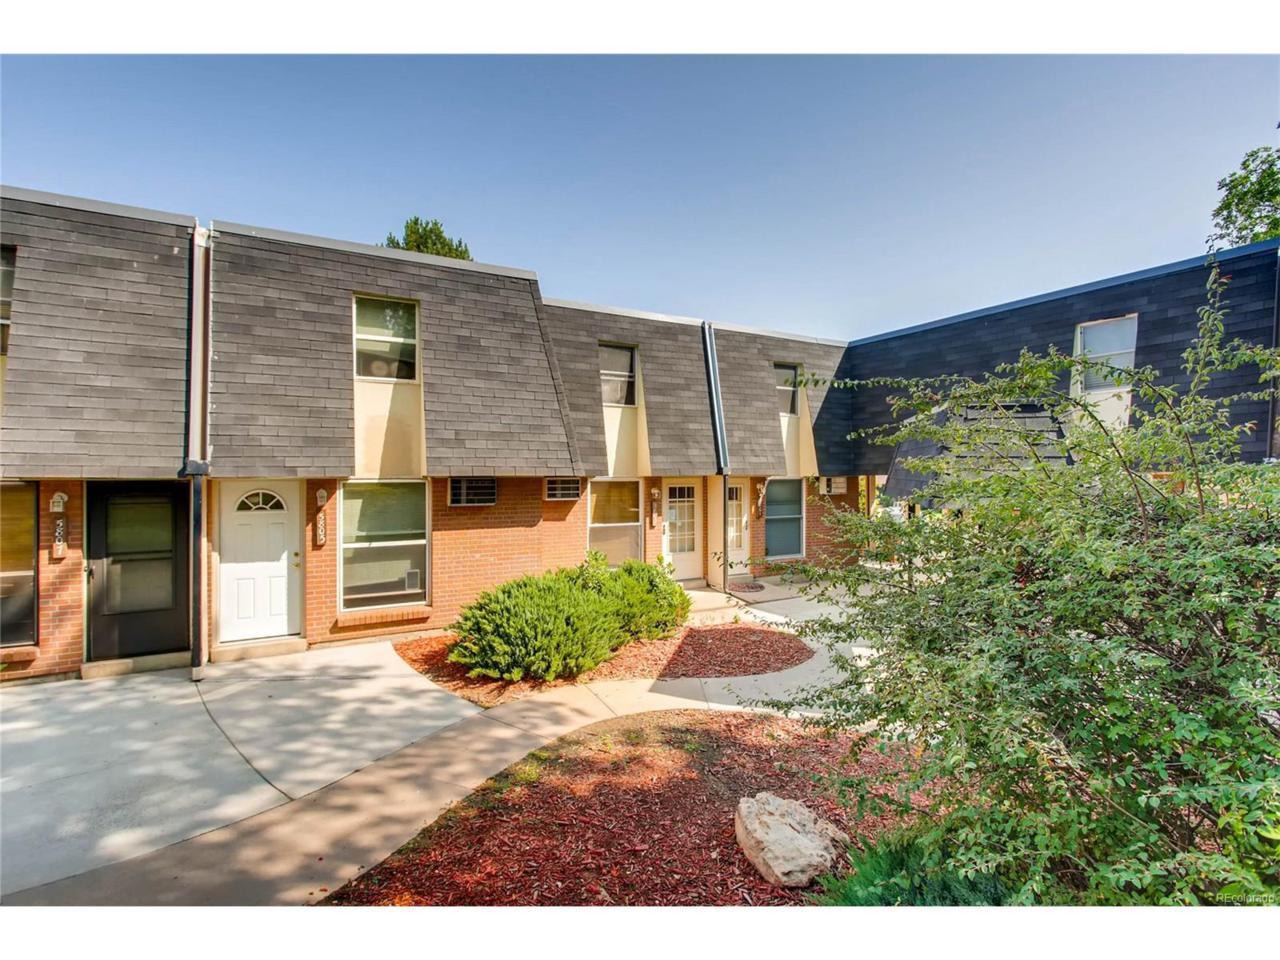 5801 S Pearl Street, Centennial, CO 80121 (MLS #9456071) :: 8z Real Estate